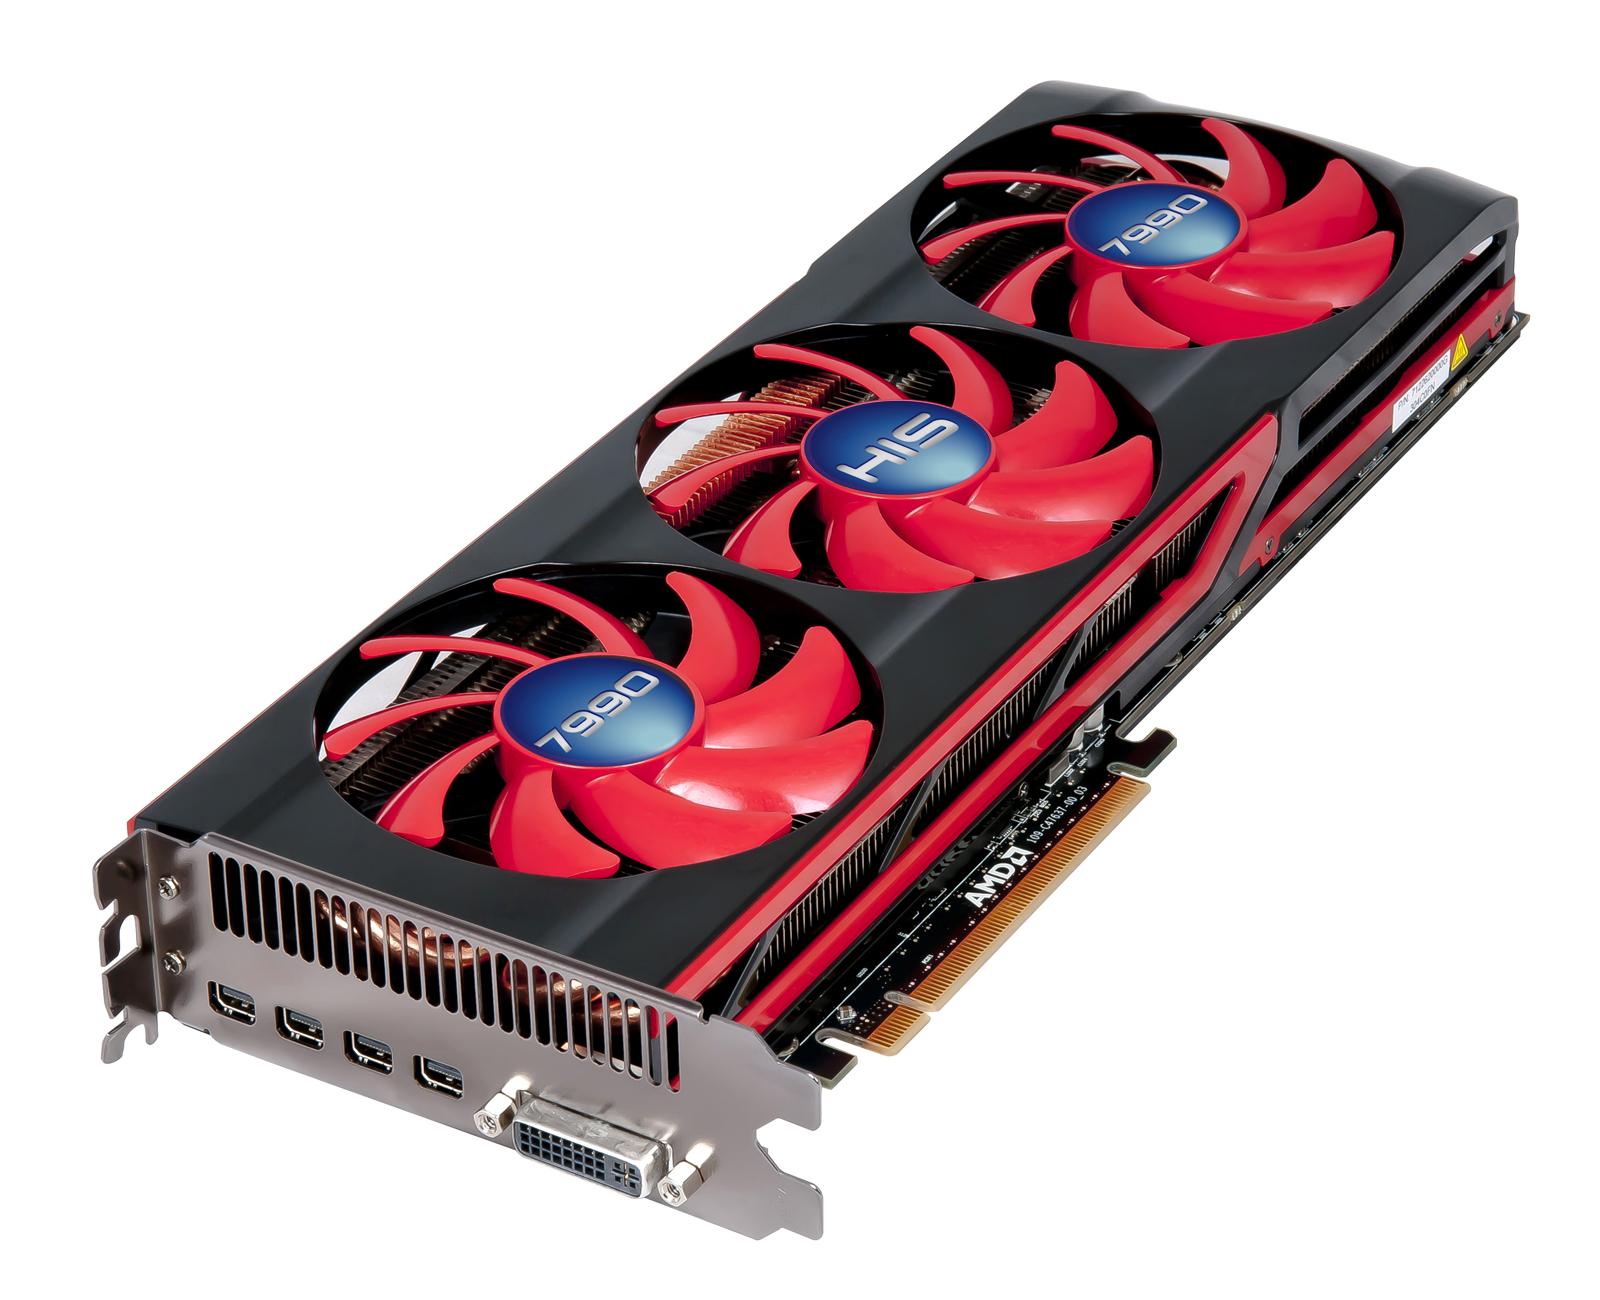 HIS Launches HD 7990 Fan Edition | VideoCardz.com